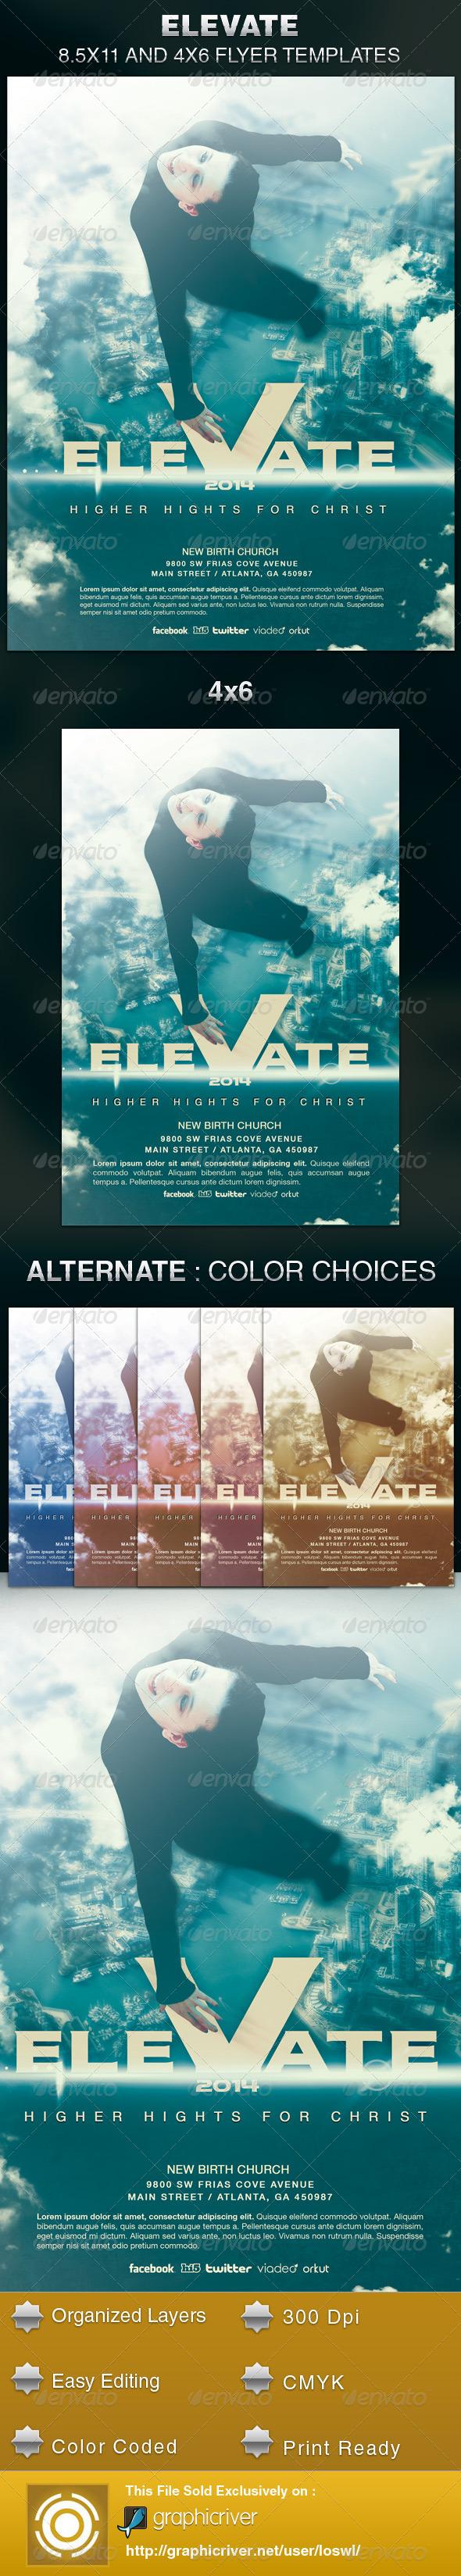 Elevate Church Flyer Template  - Church Flyers